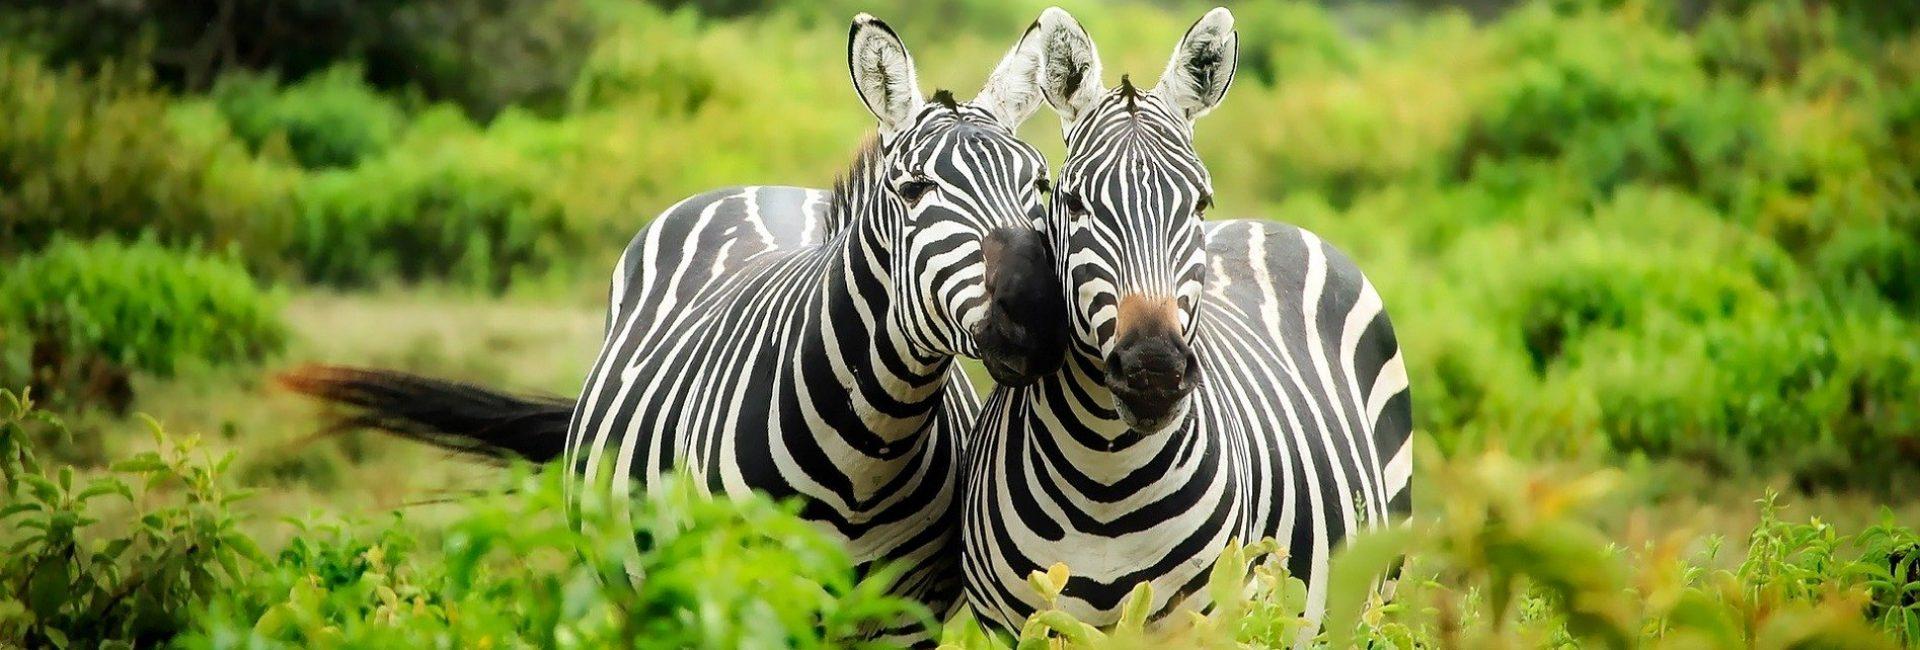 Kenija - putovanje u safari Maasa Mara